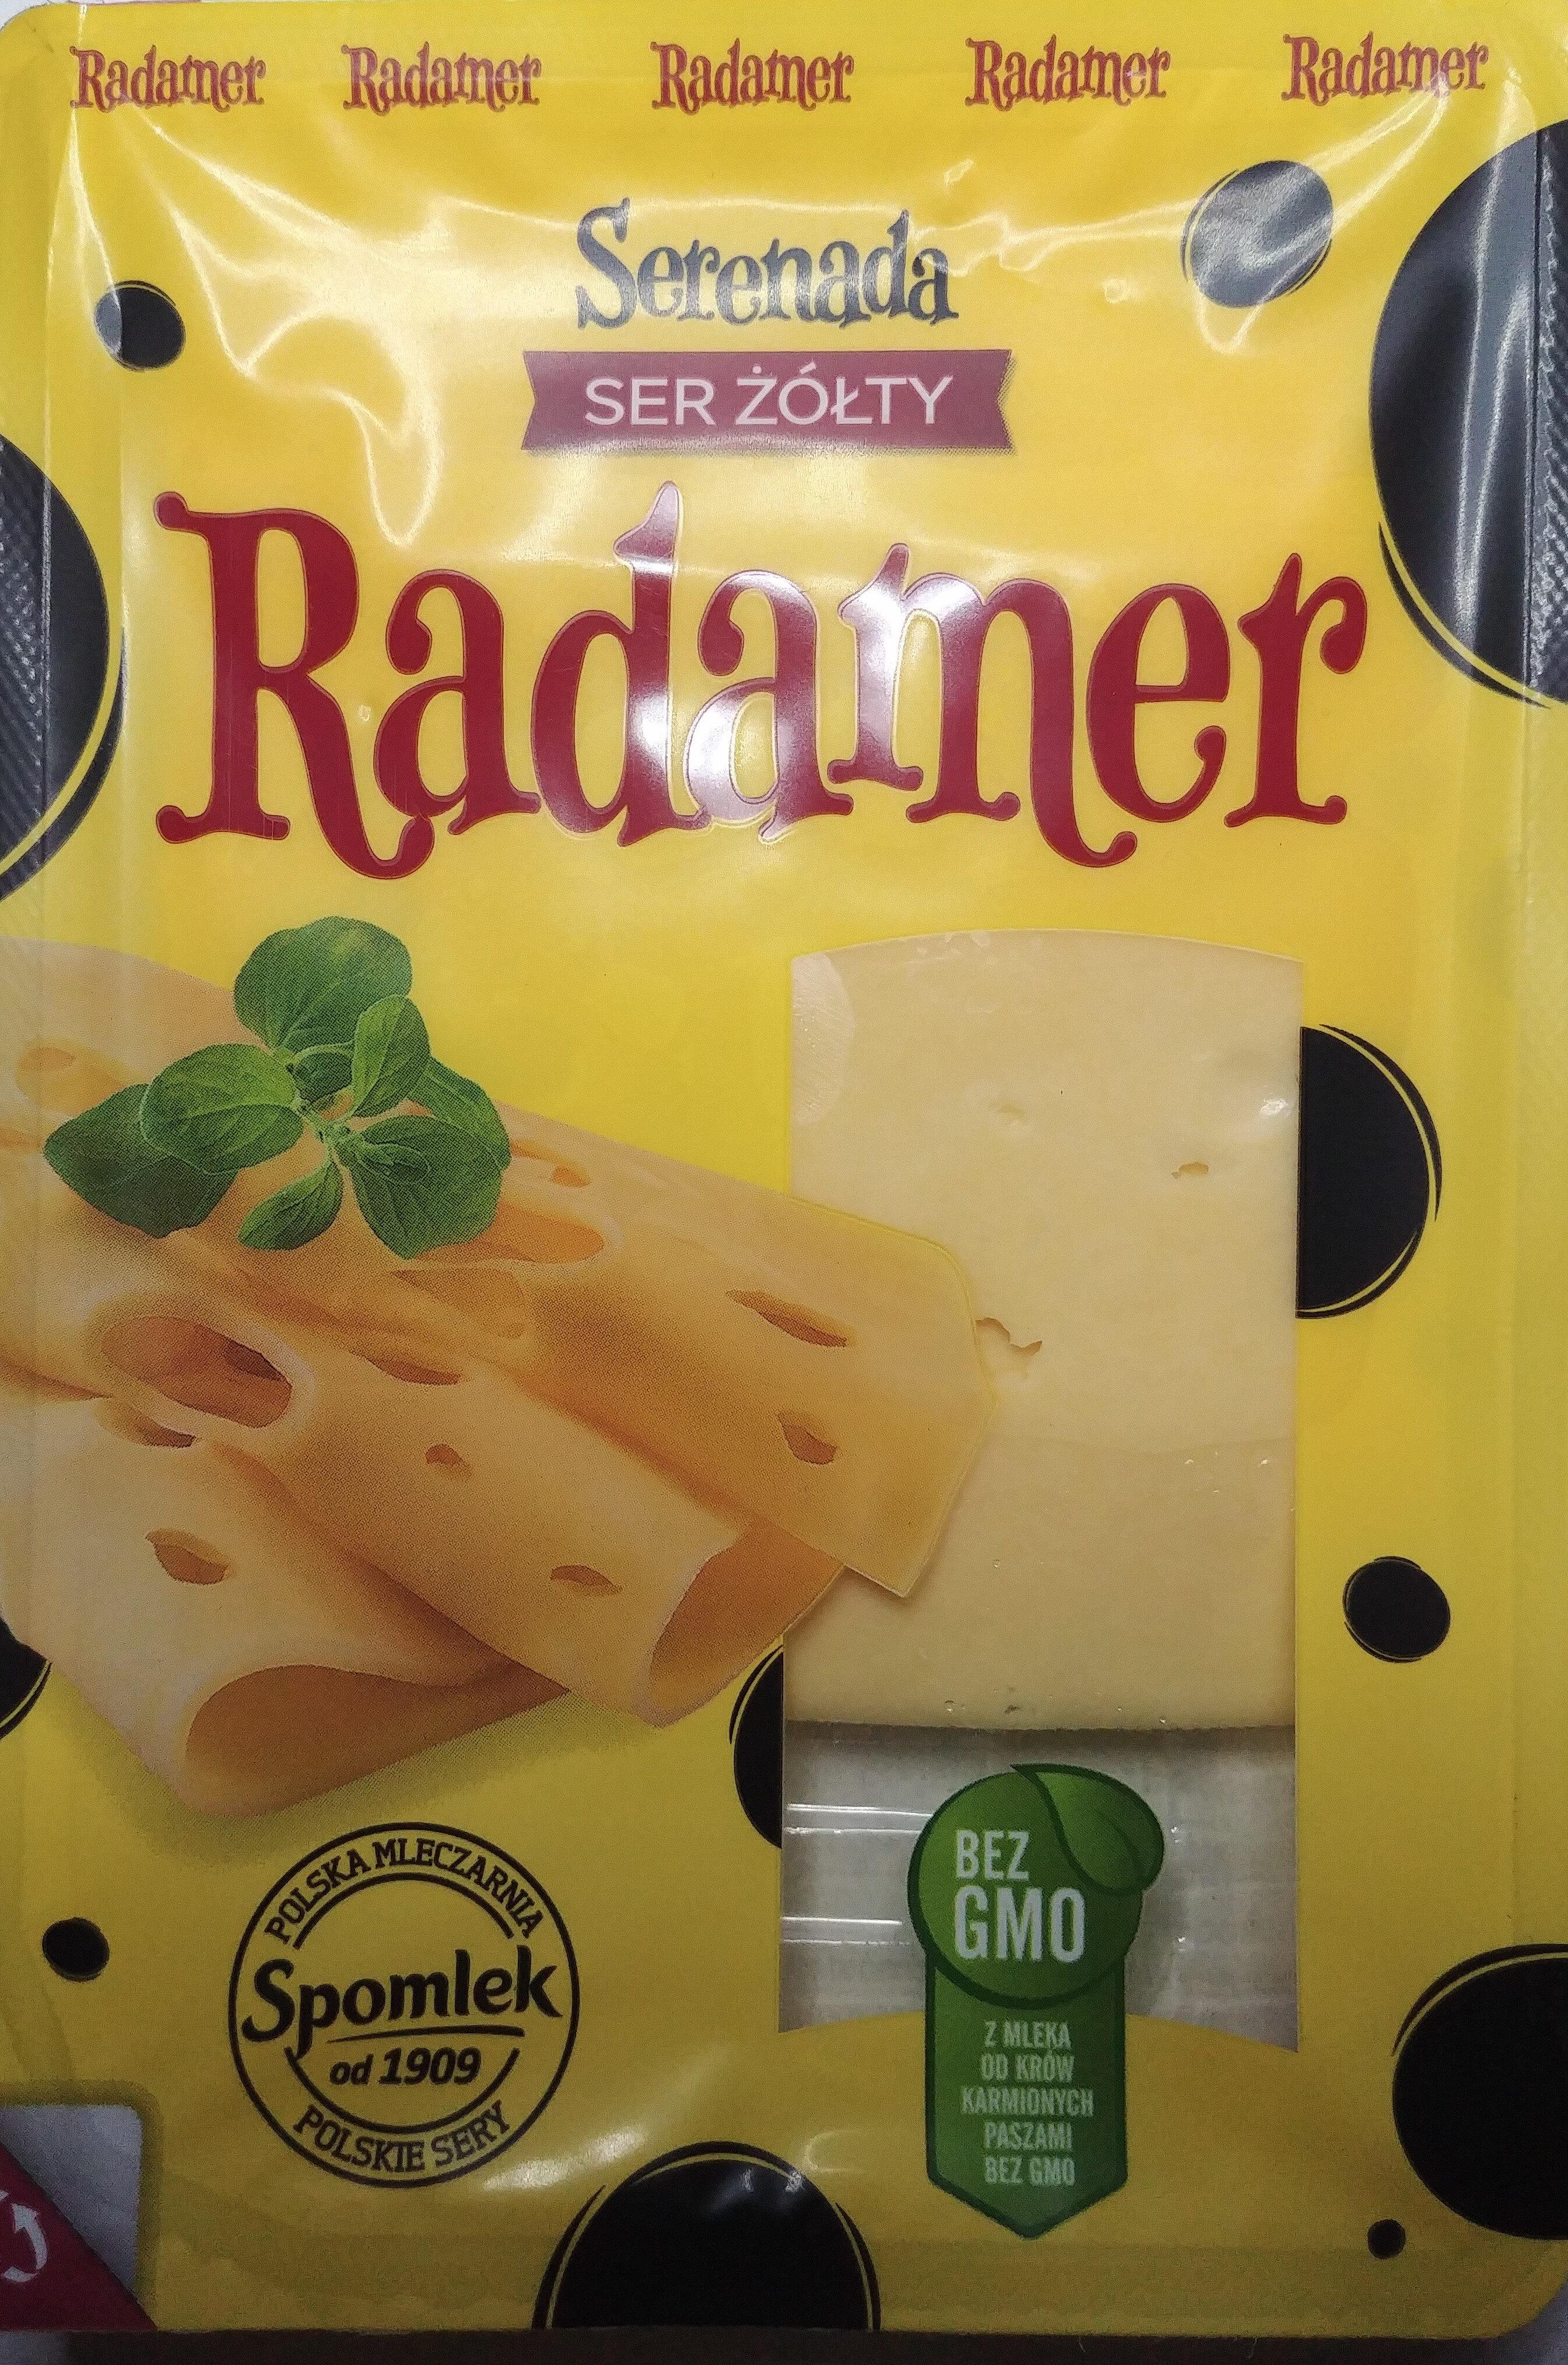 Ser żółty Radamer - Product